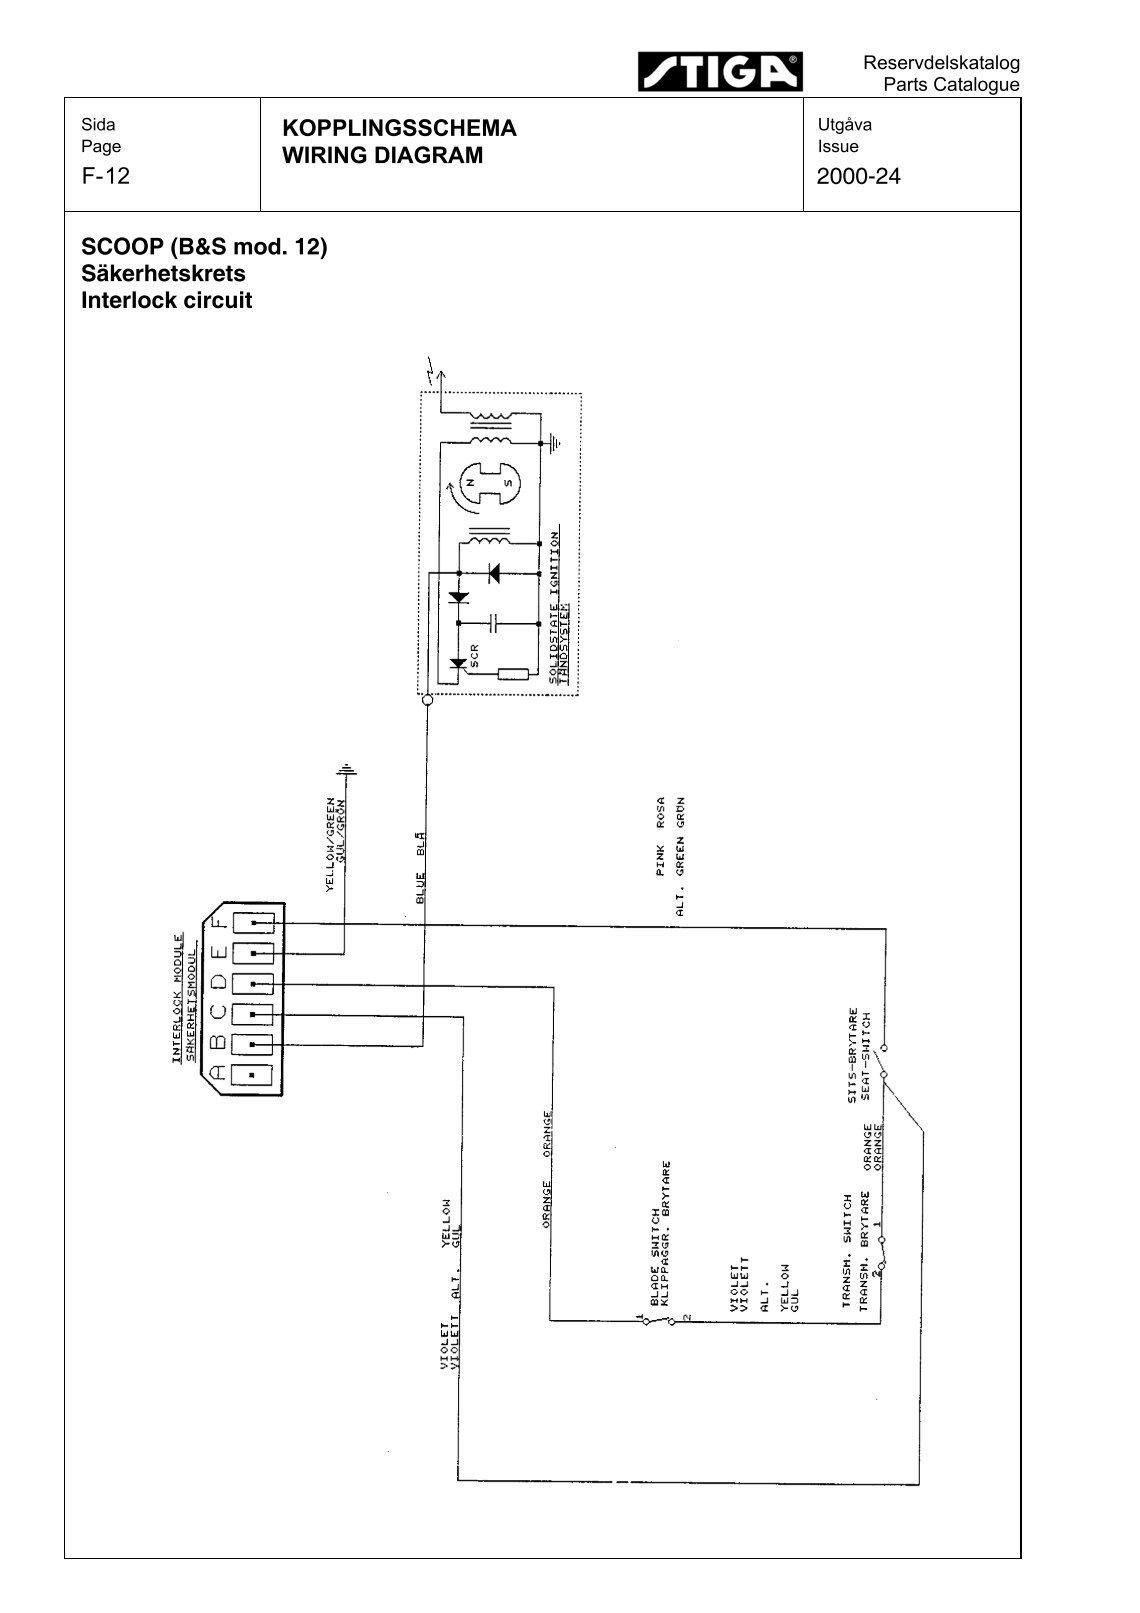 small resolution of m1008 wiring diagram wiring schematics diagram rh wiring regdiy co 1984 cucv m1009 light diagram cucv alternator wiring